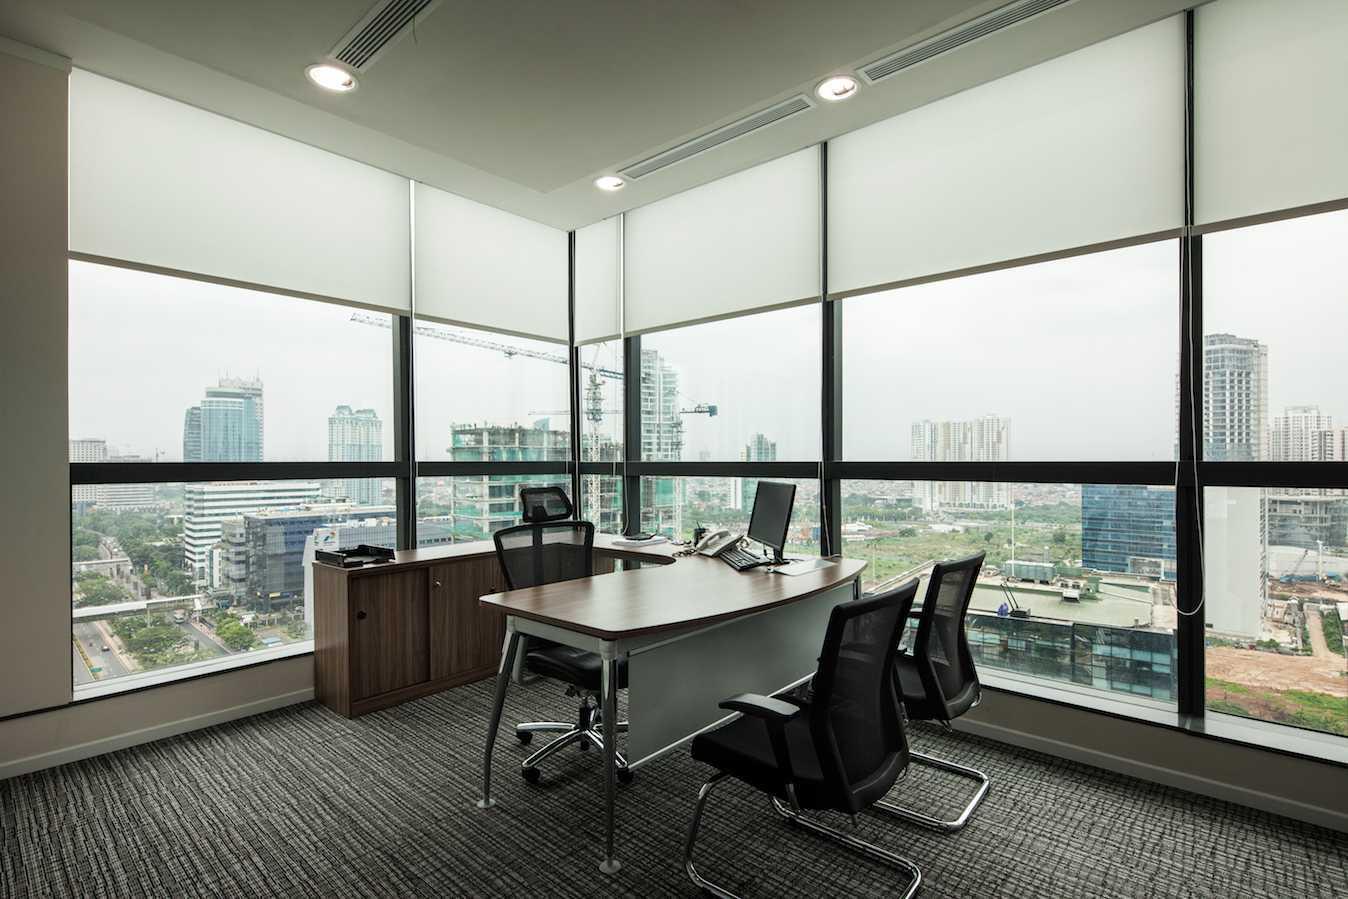 Pt Asa Adiguna Schaeffler Bearings Indonesia Lippo Kuningan Building Lippo Kuningan Building Office Room Skandinavia 24548